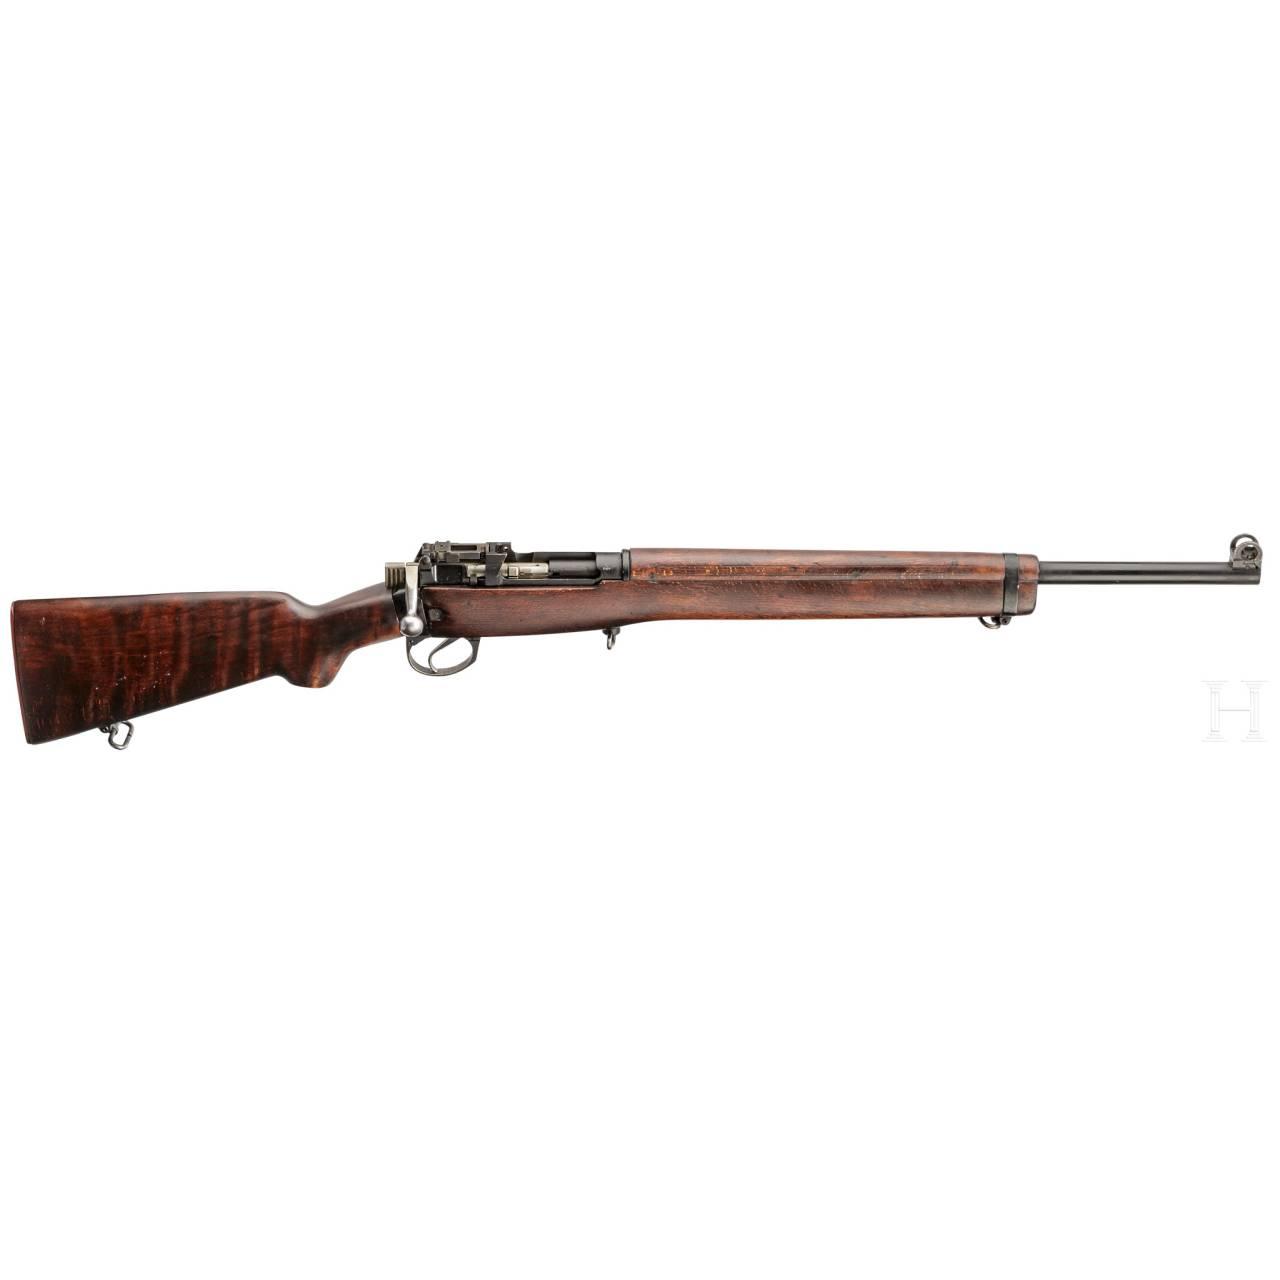 Enfield No. 8 Mark I, KK-Übungsgewehr